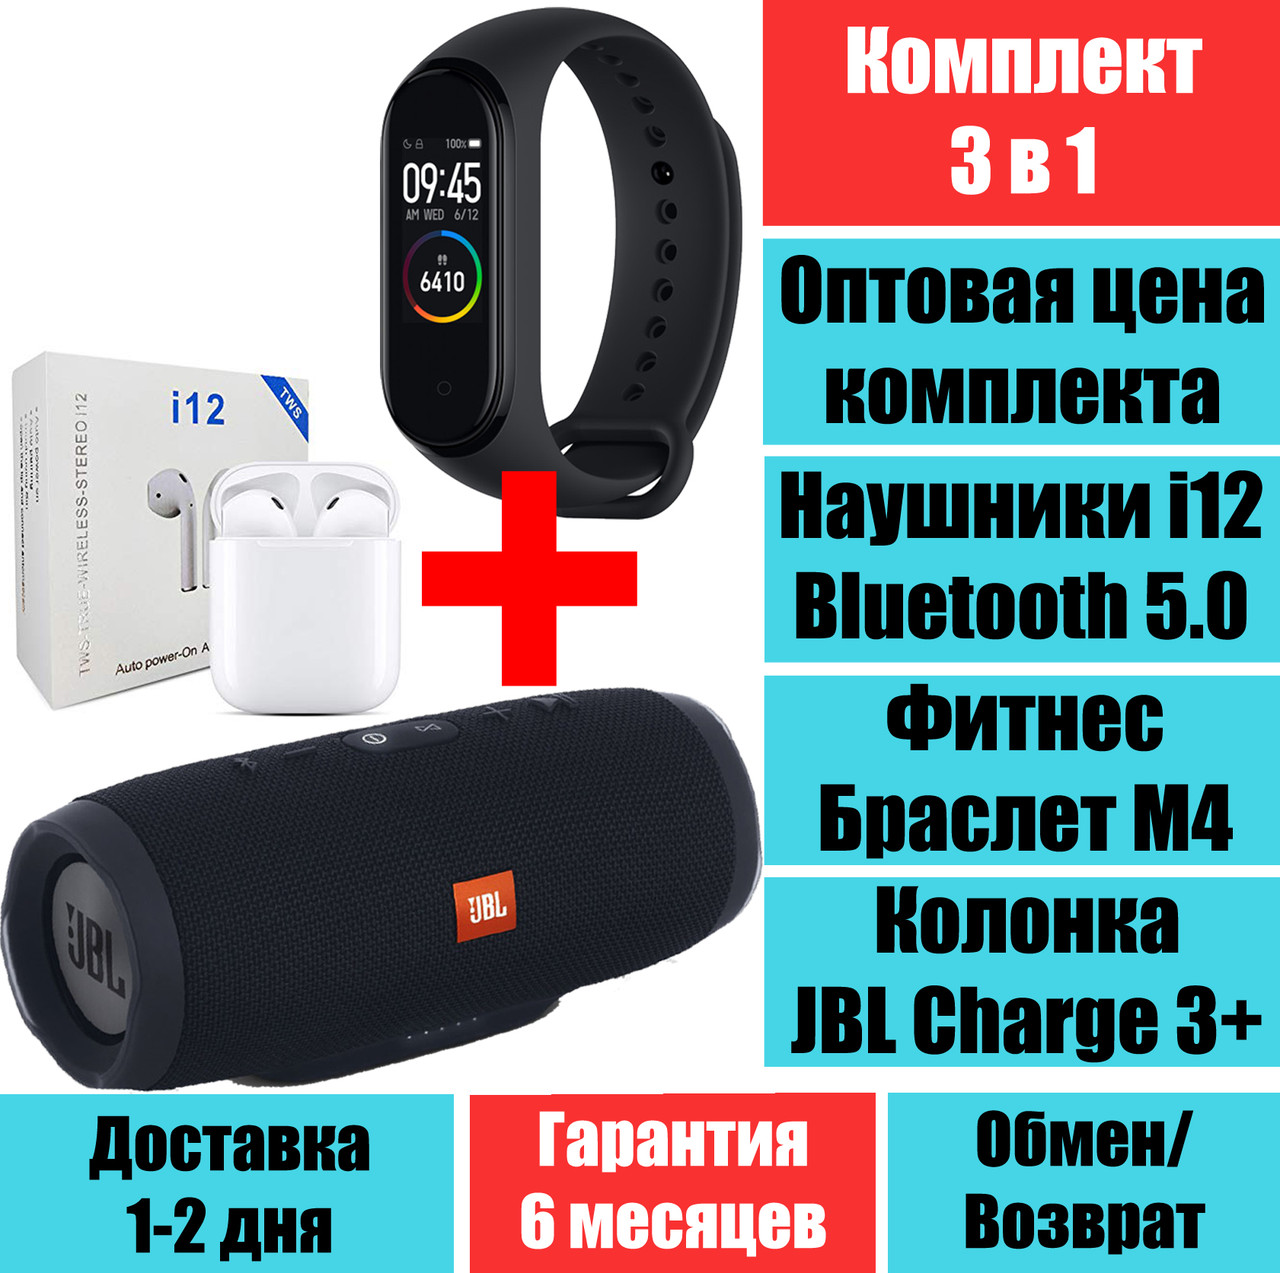 Колонка JBL Charge 3+ Черный, Фитнес браслет M4, наушники блютус i12 Mini Bluetooth Комплект QualitiReplica